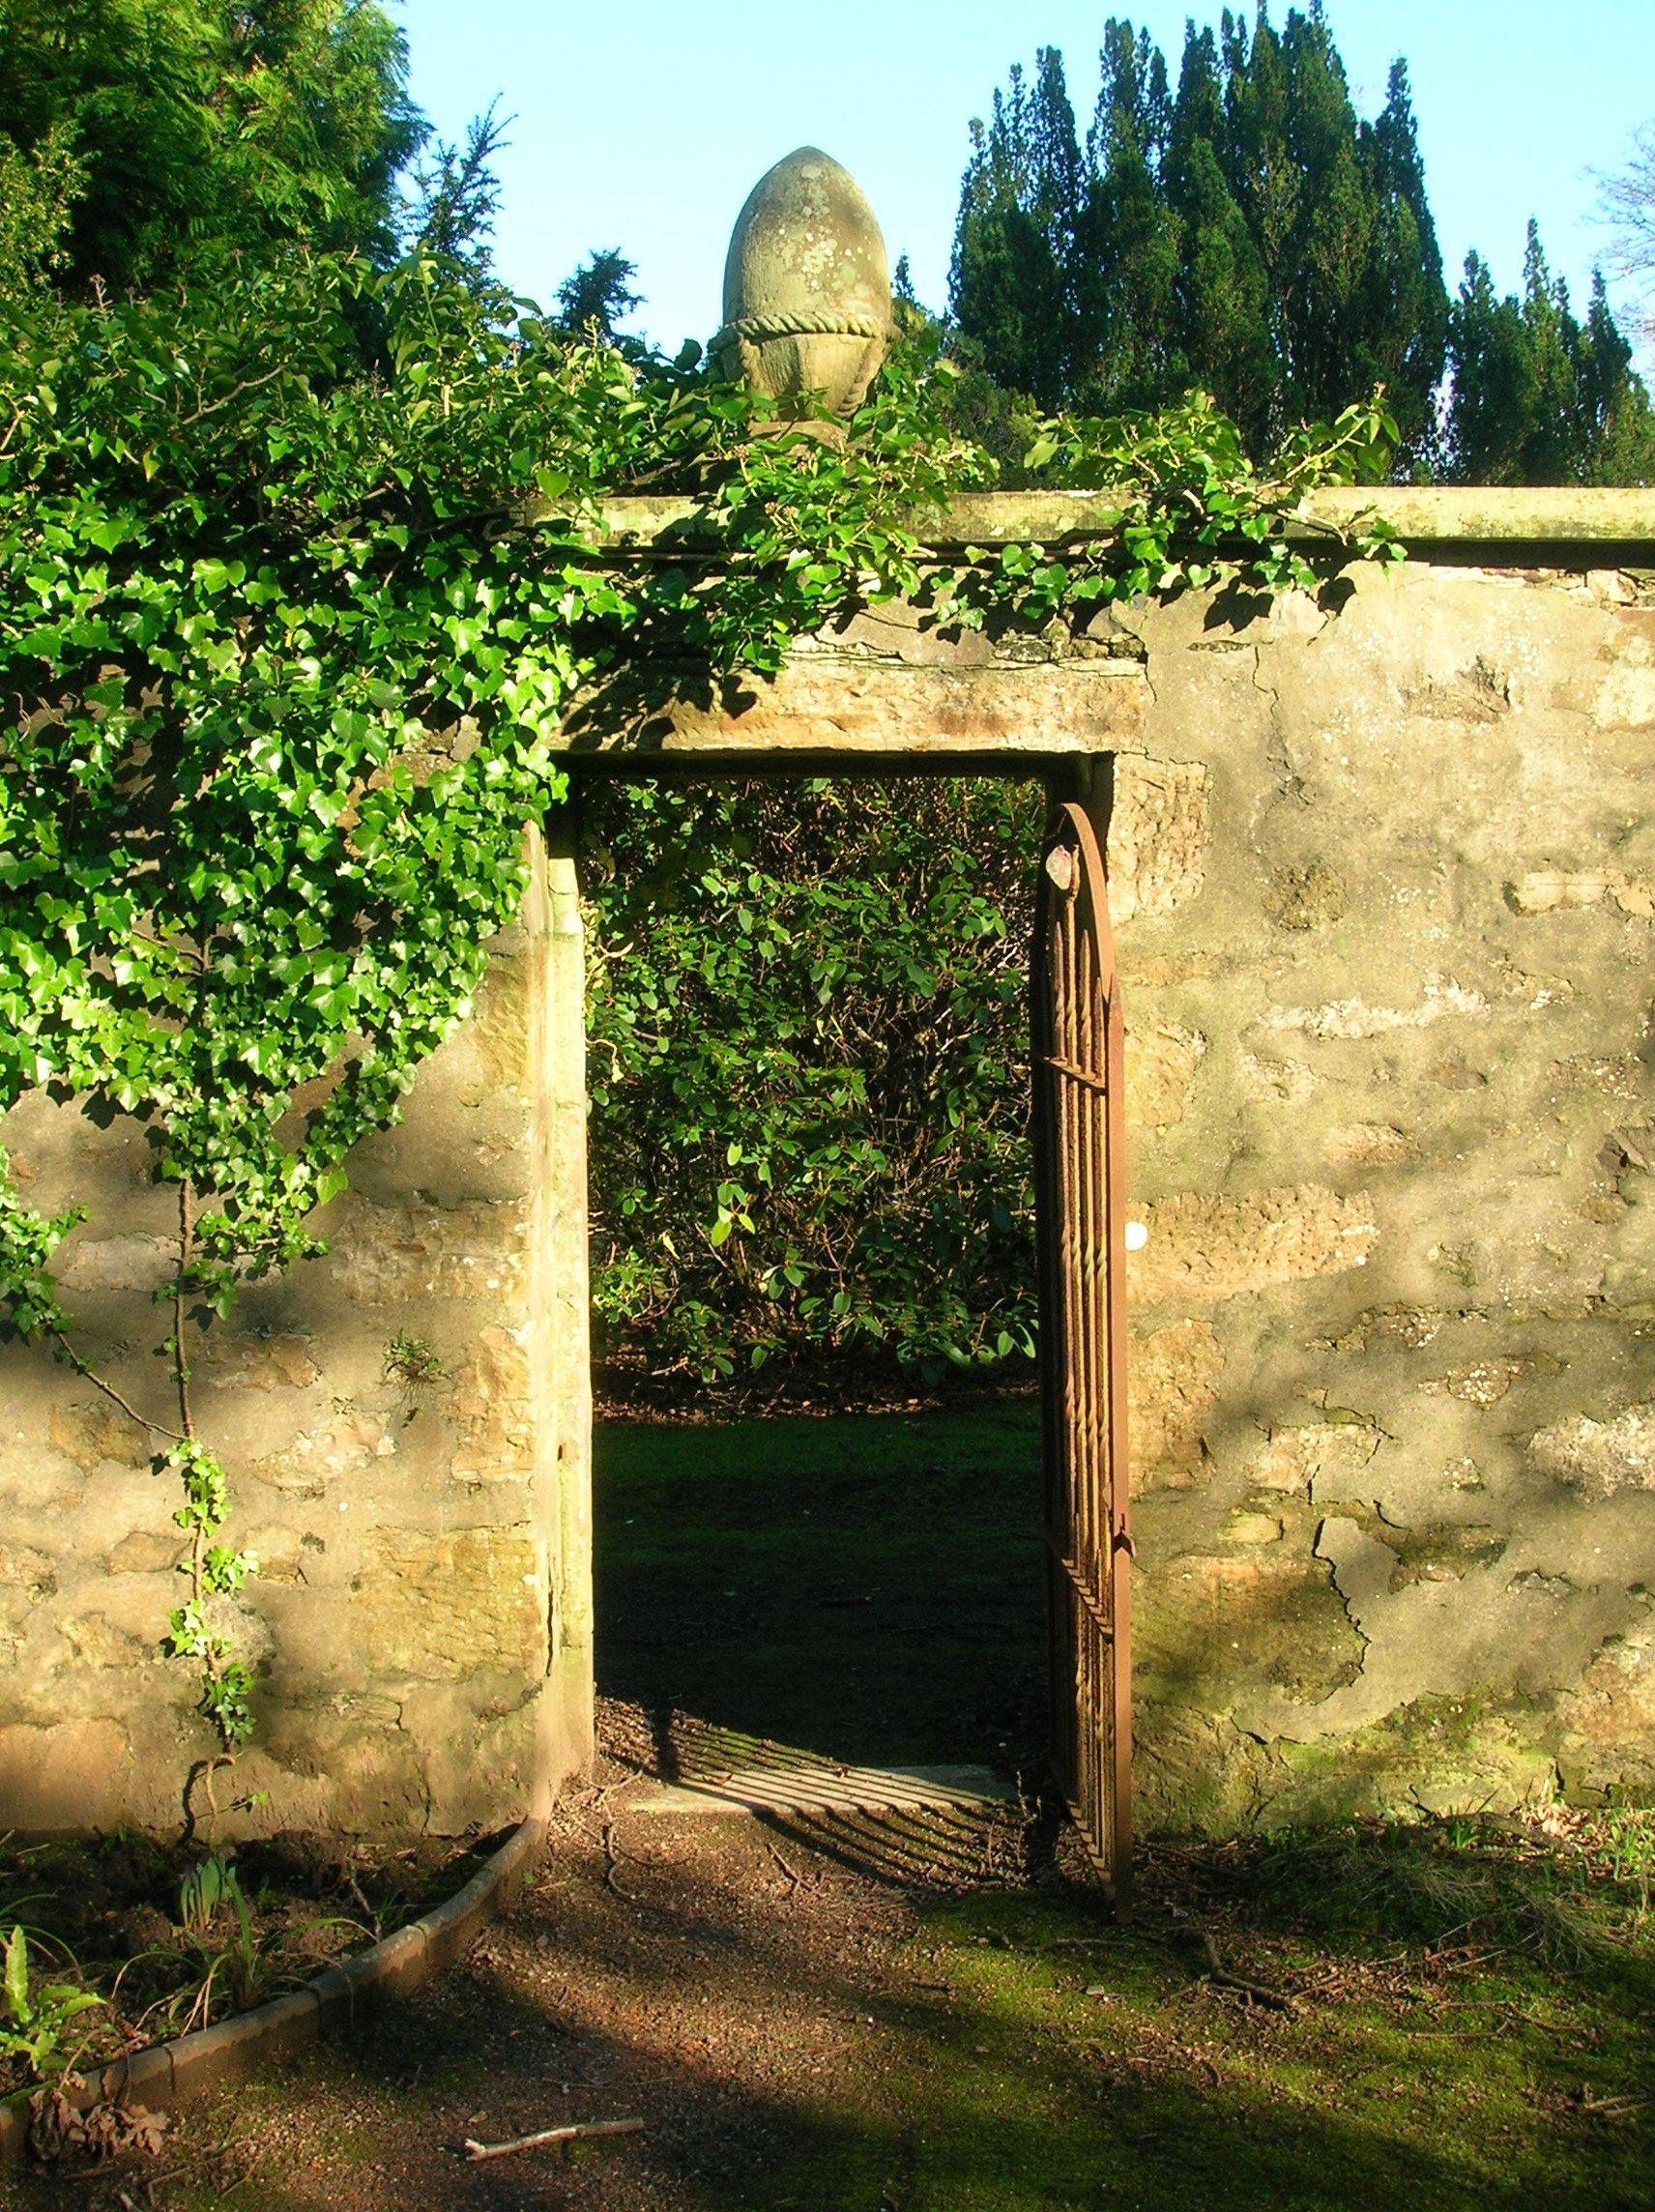 Rock Wall Garden | File:Perceton wall garden door and pineapple.JPG ...